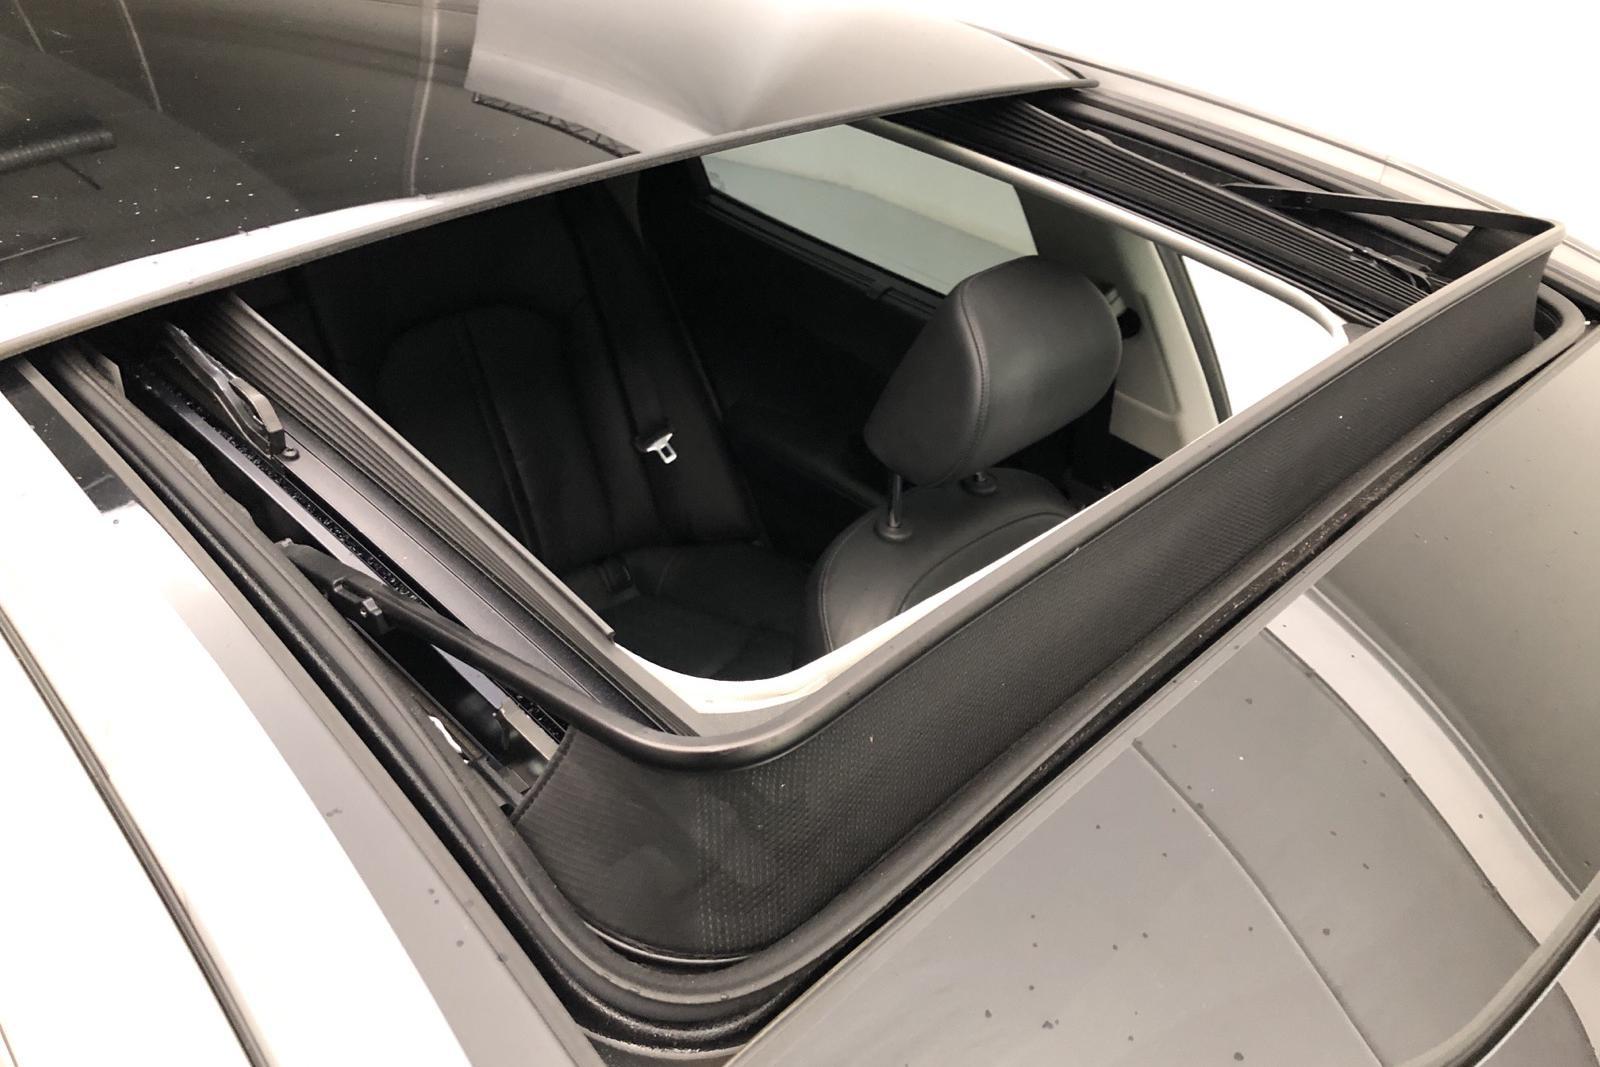 KIA Optima 2.0 GDi Plug-in Hybrid SW (205hk) - 70 550 km - Automatic - gray - 2018